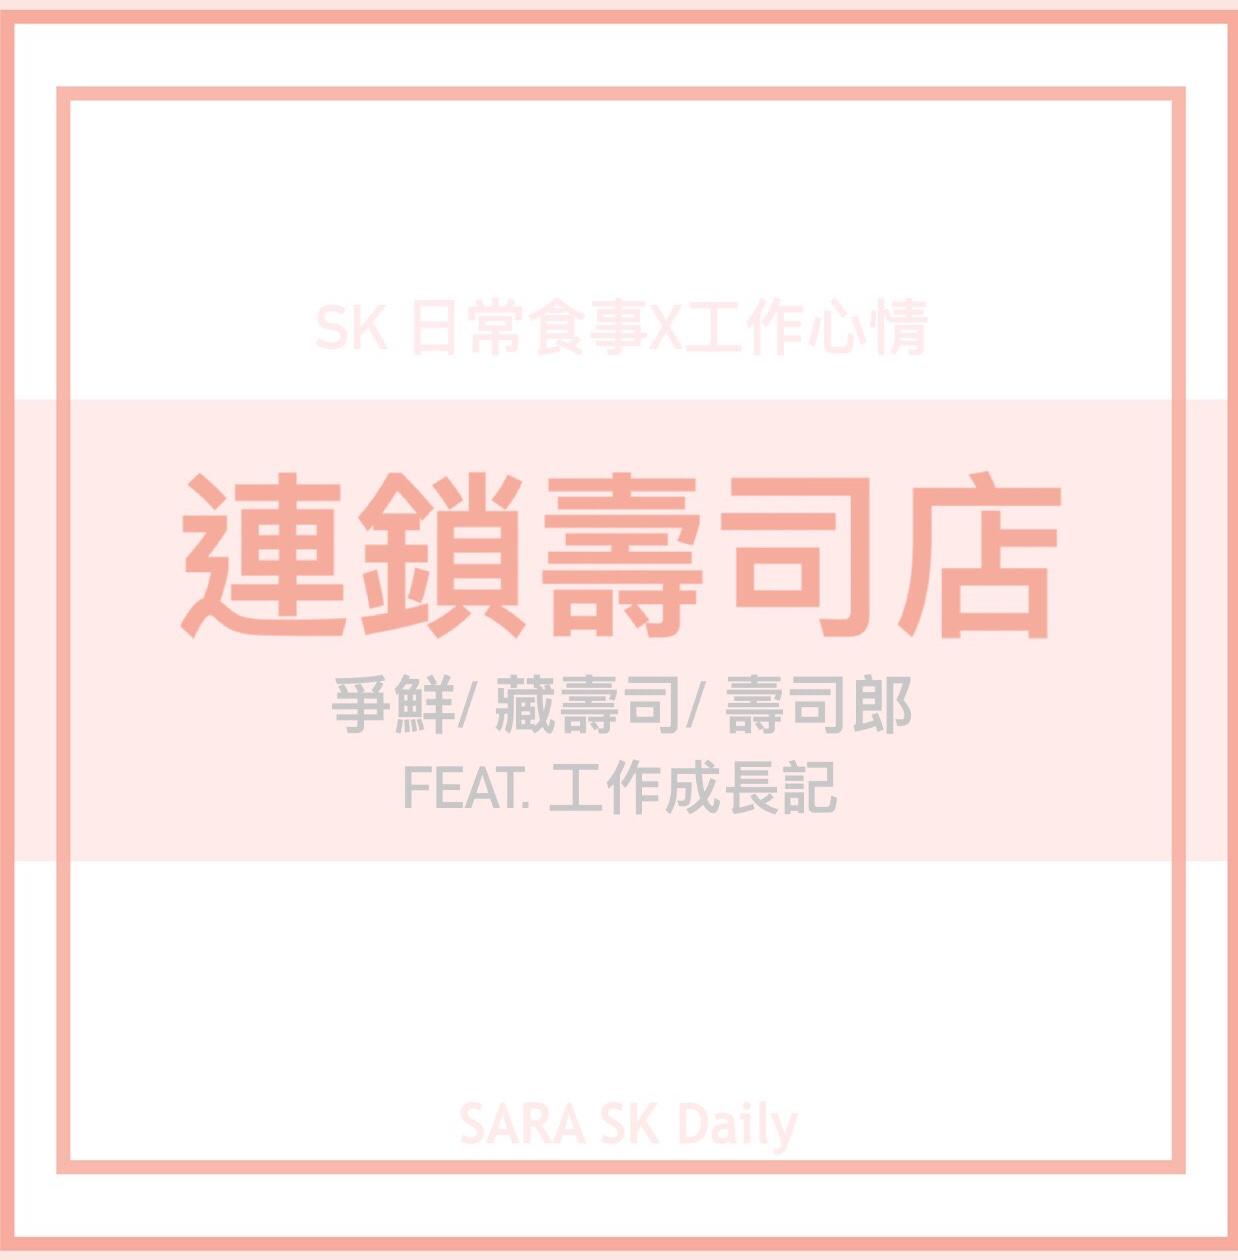 EP28 #生活日記x日常食事 ♡工作小成長、連鎖壽司店